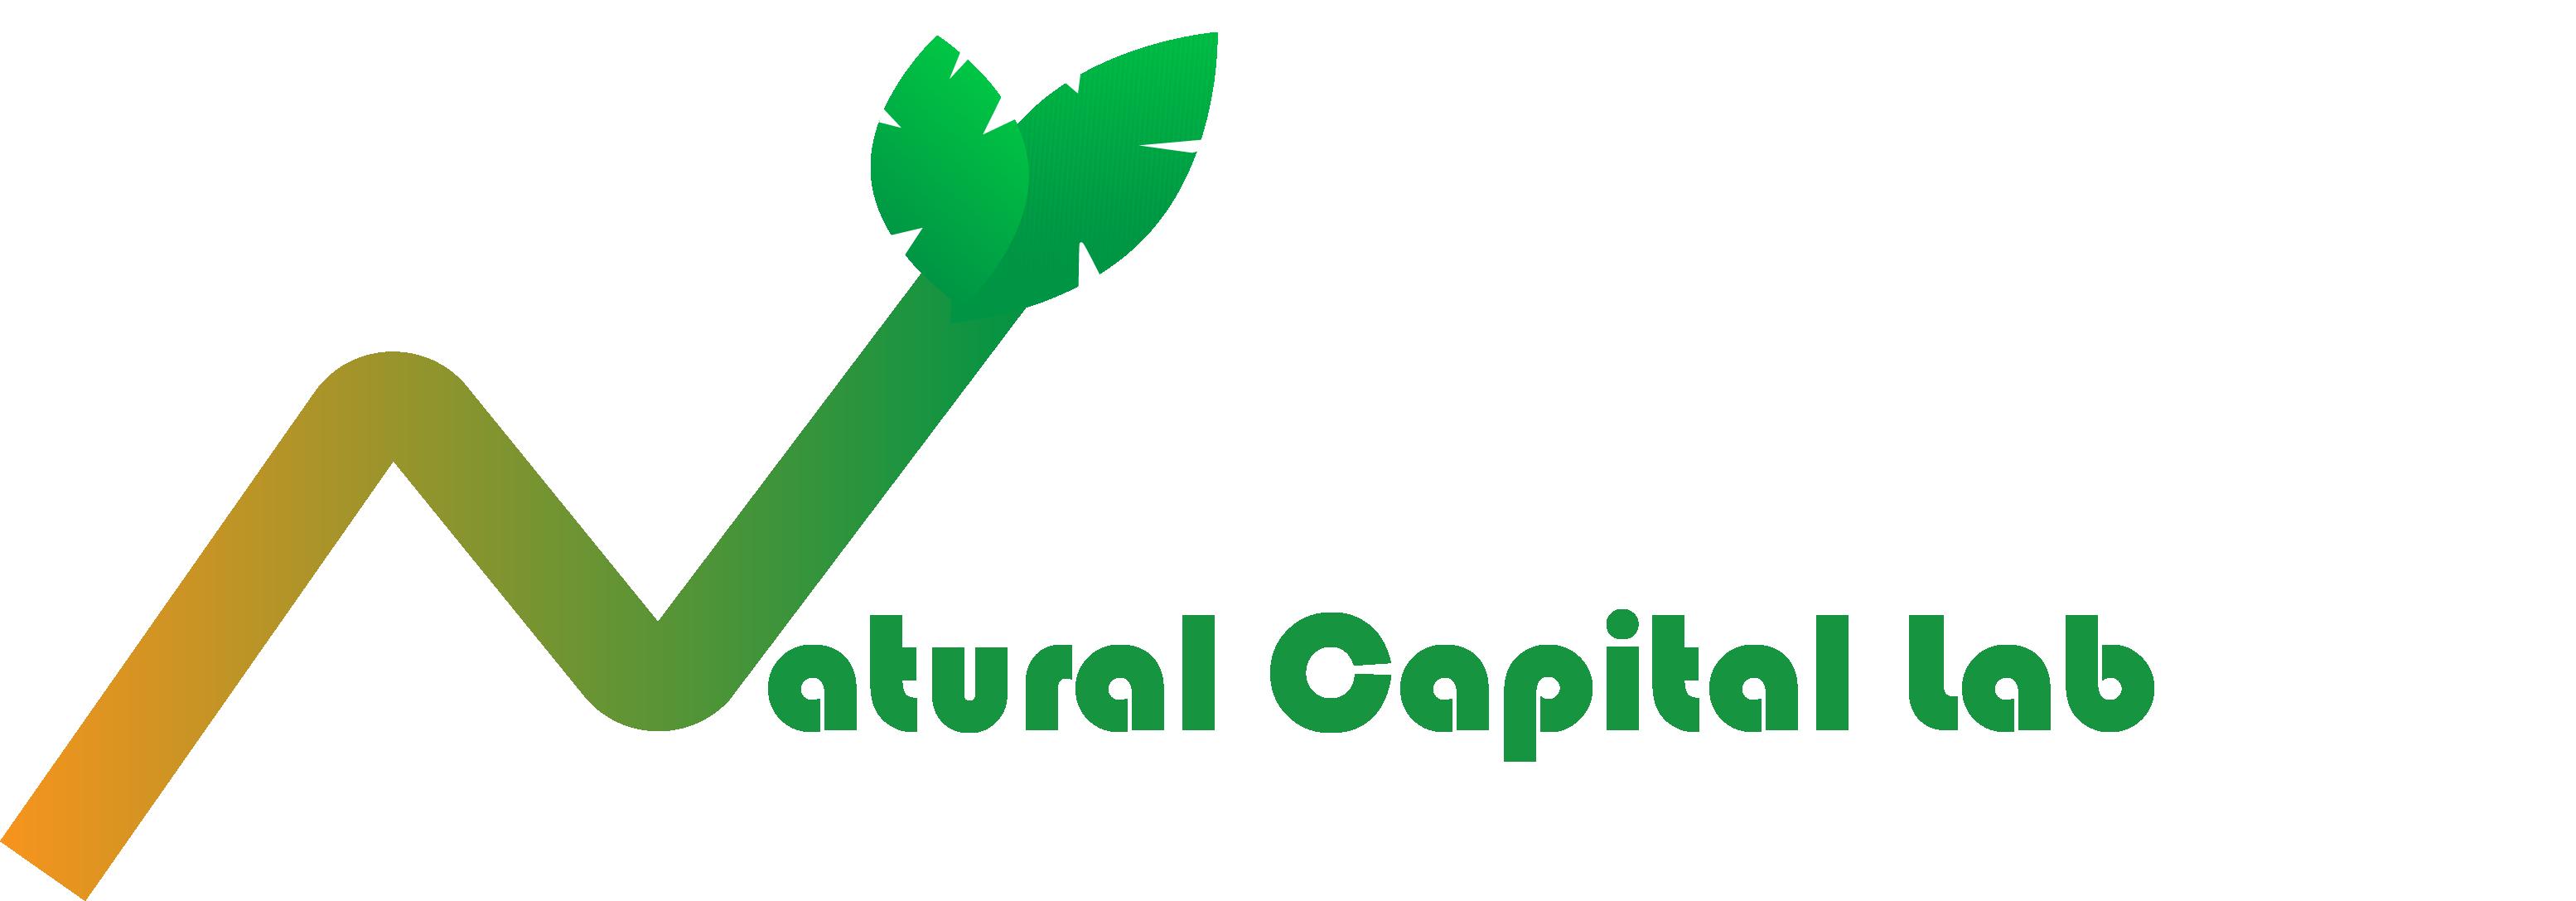 Natural Capital Lab